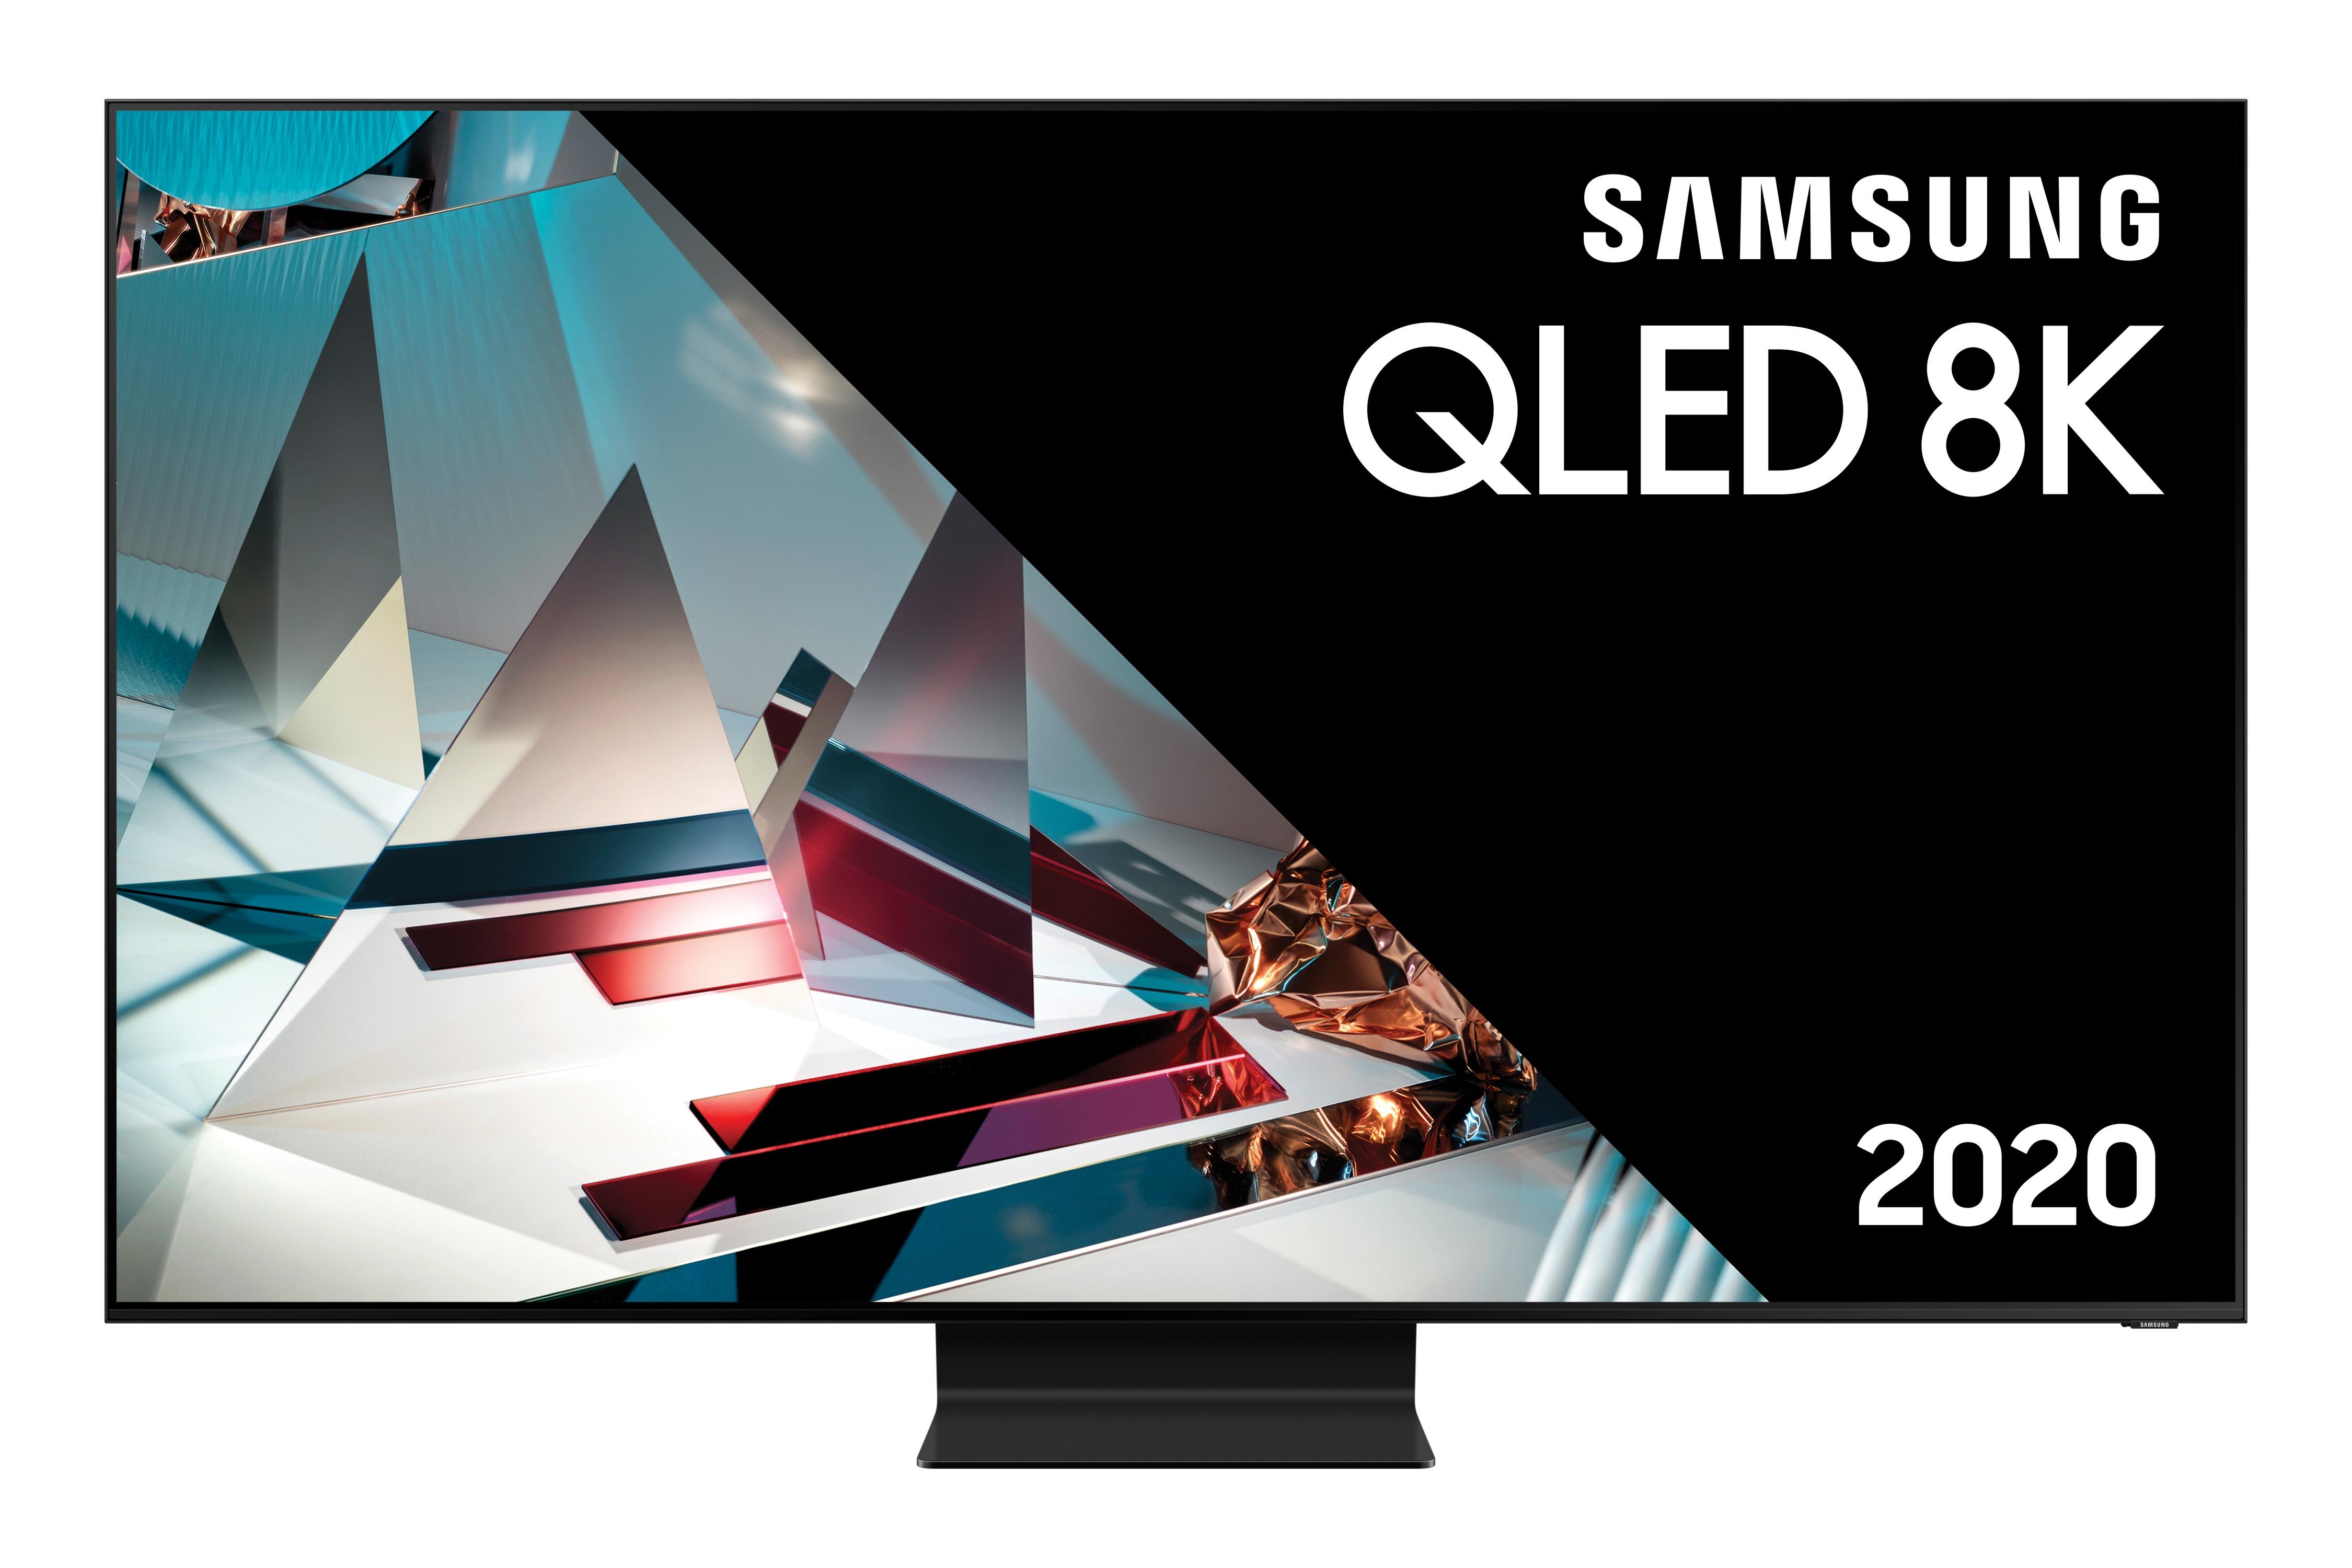 Samsung QE65Q800TAL 65 inch QLED TV